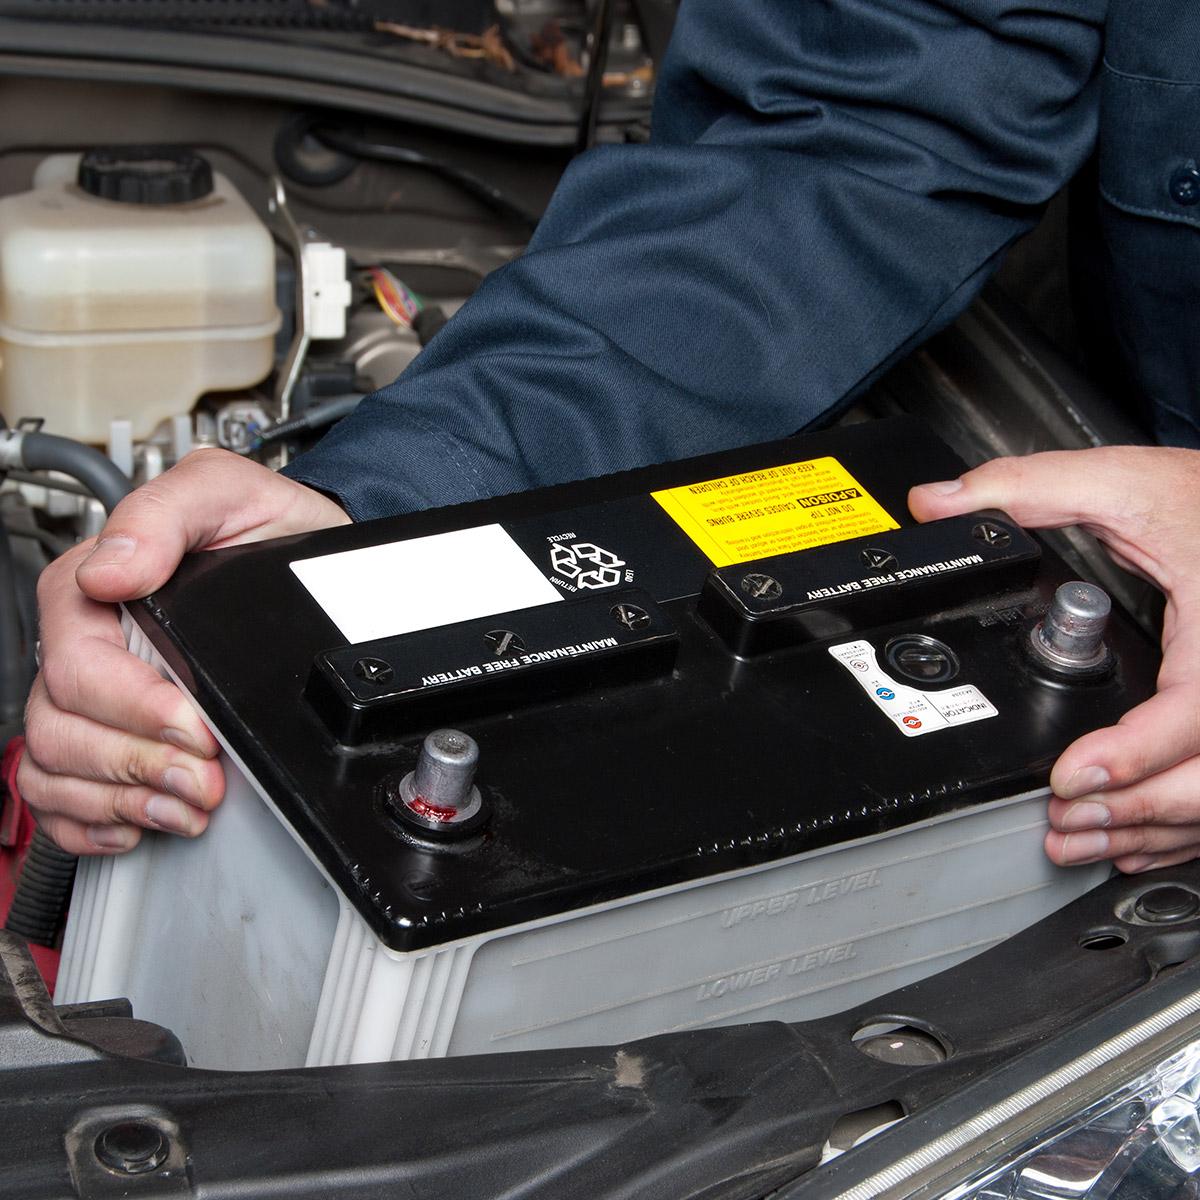 Holden Commodore battery replacement costs & repairs | AutoGuru